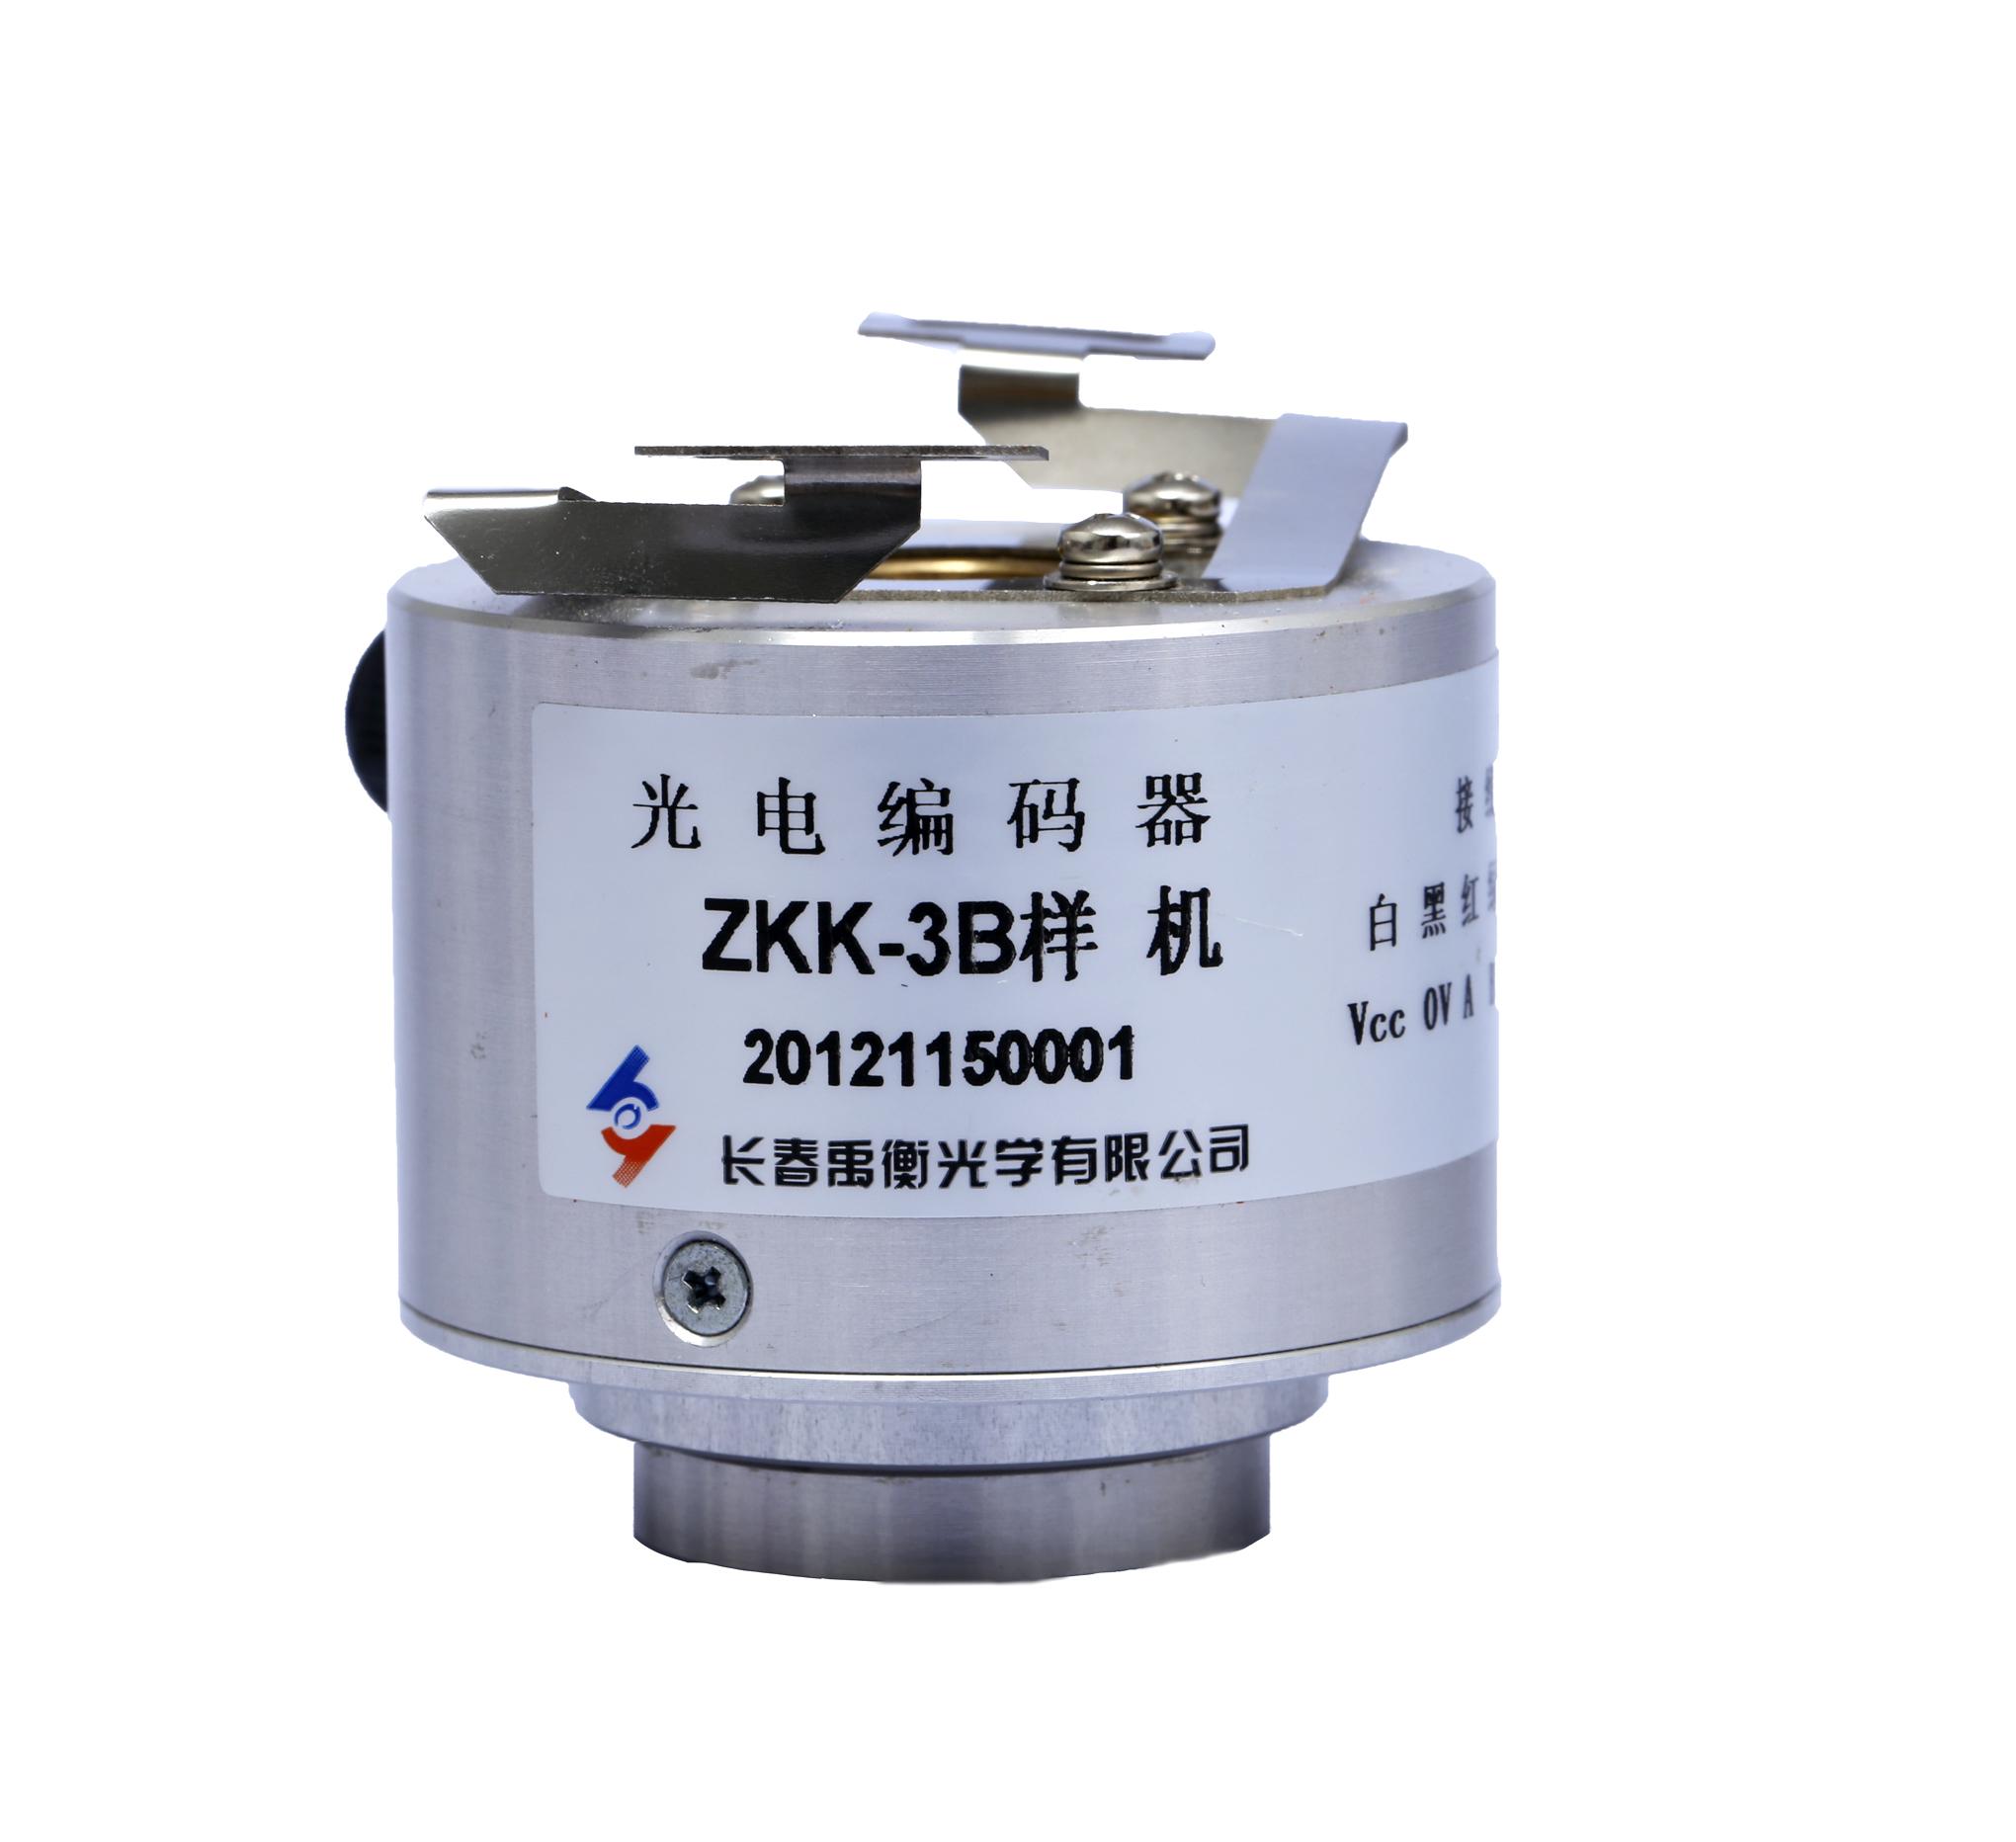 ZKK-3B 增量式光栅旋转编码器 禹衡光学